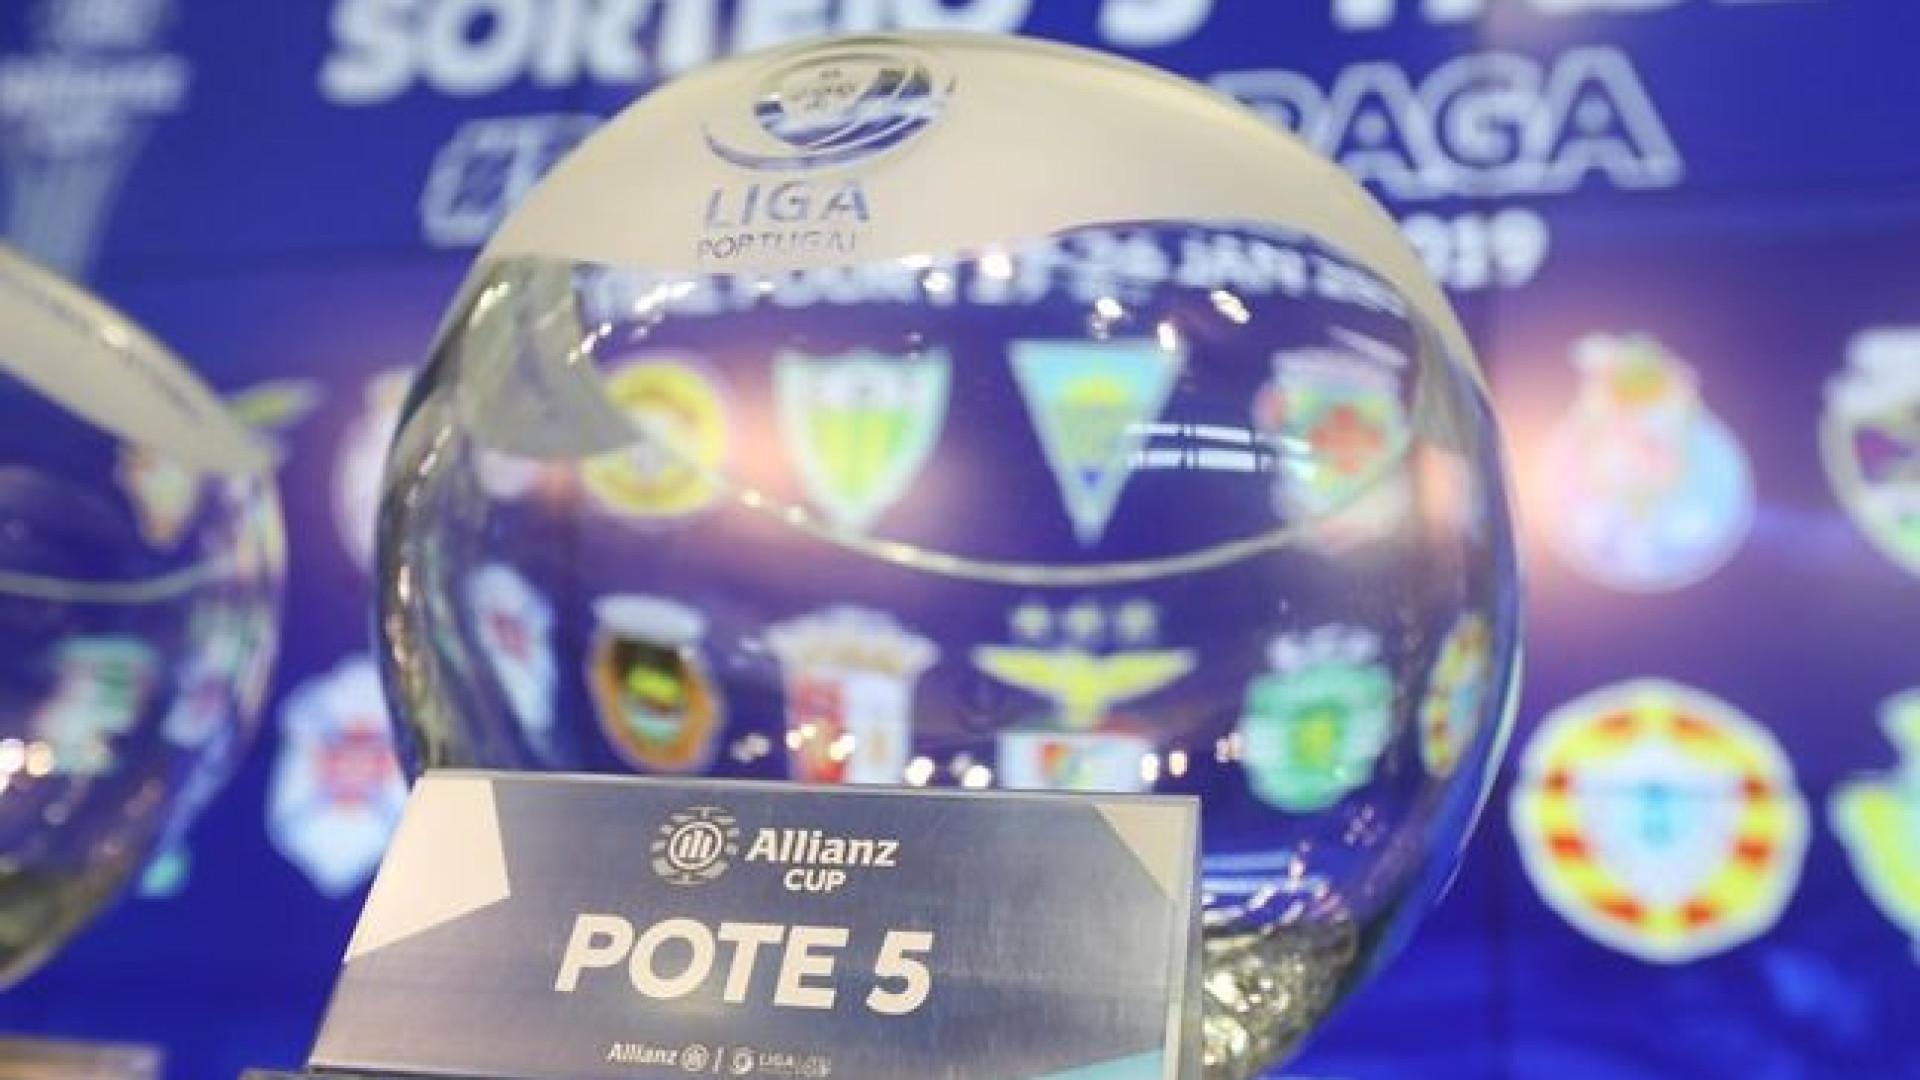 Taça da Liga: Benfica recebe Rio Ave, Sporting de Braga o Tondela